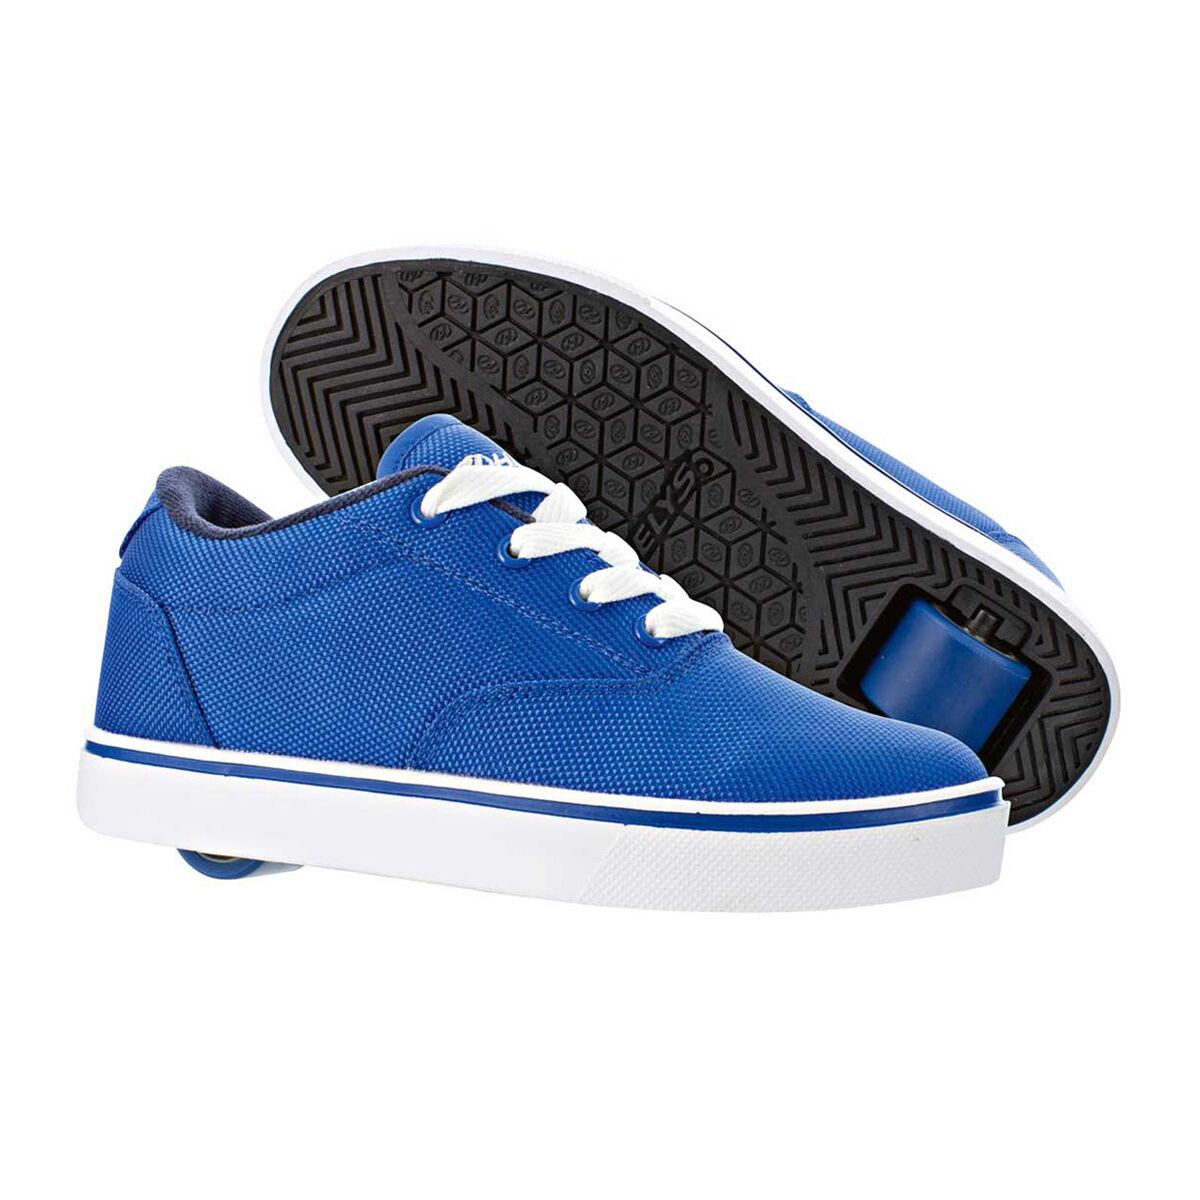 Heelys Launch Boys Shoes   Rebel Sport